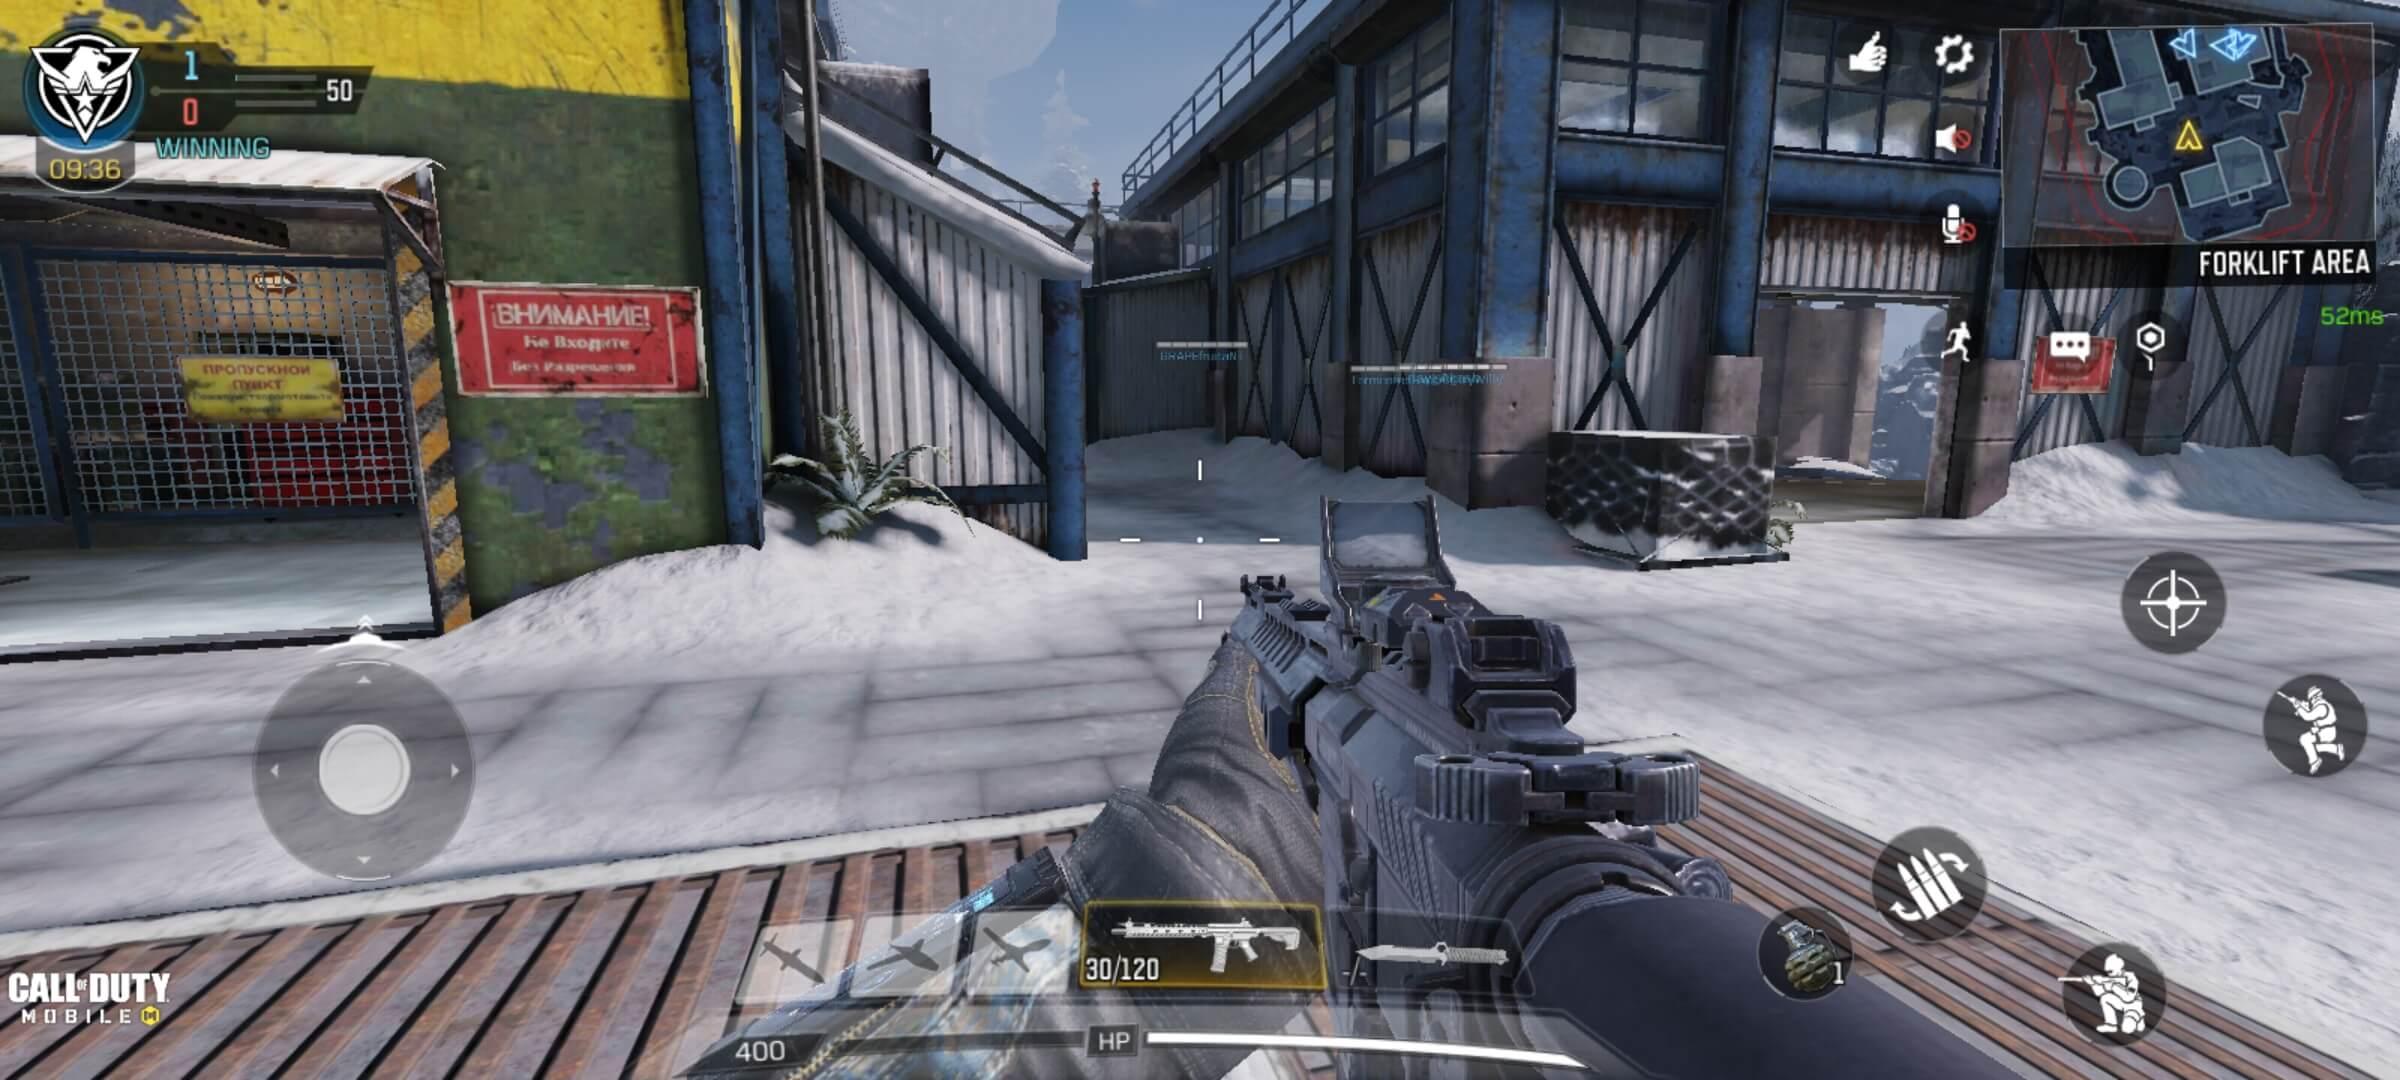 Screenshot 20200619 155500 com.activision.callofduty.shooter